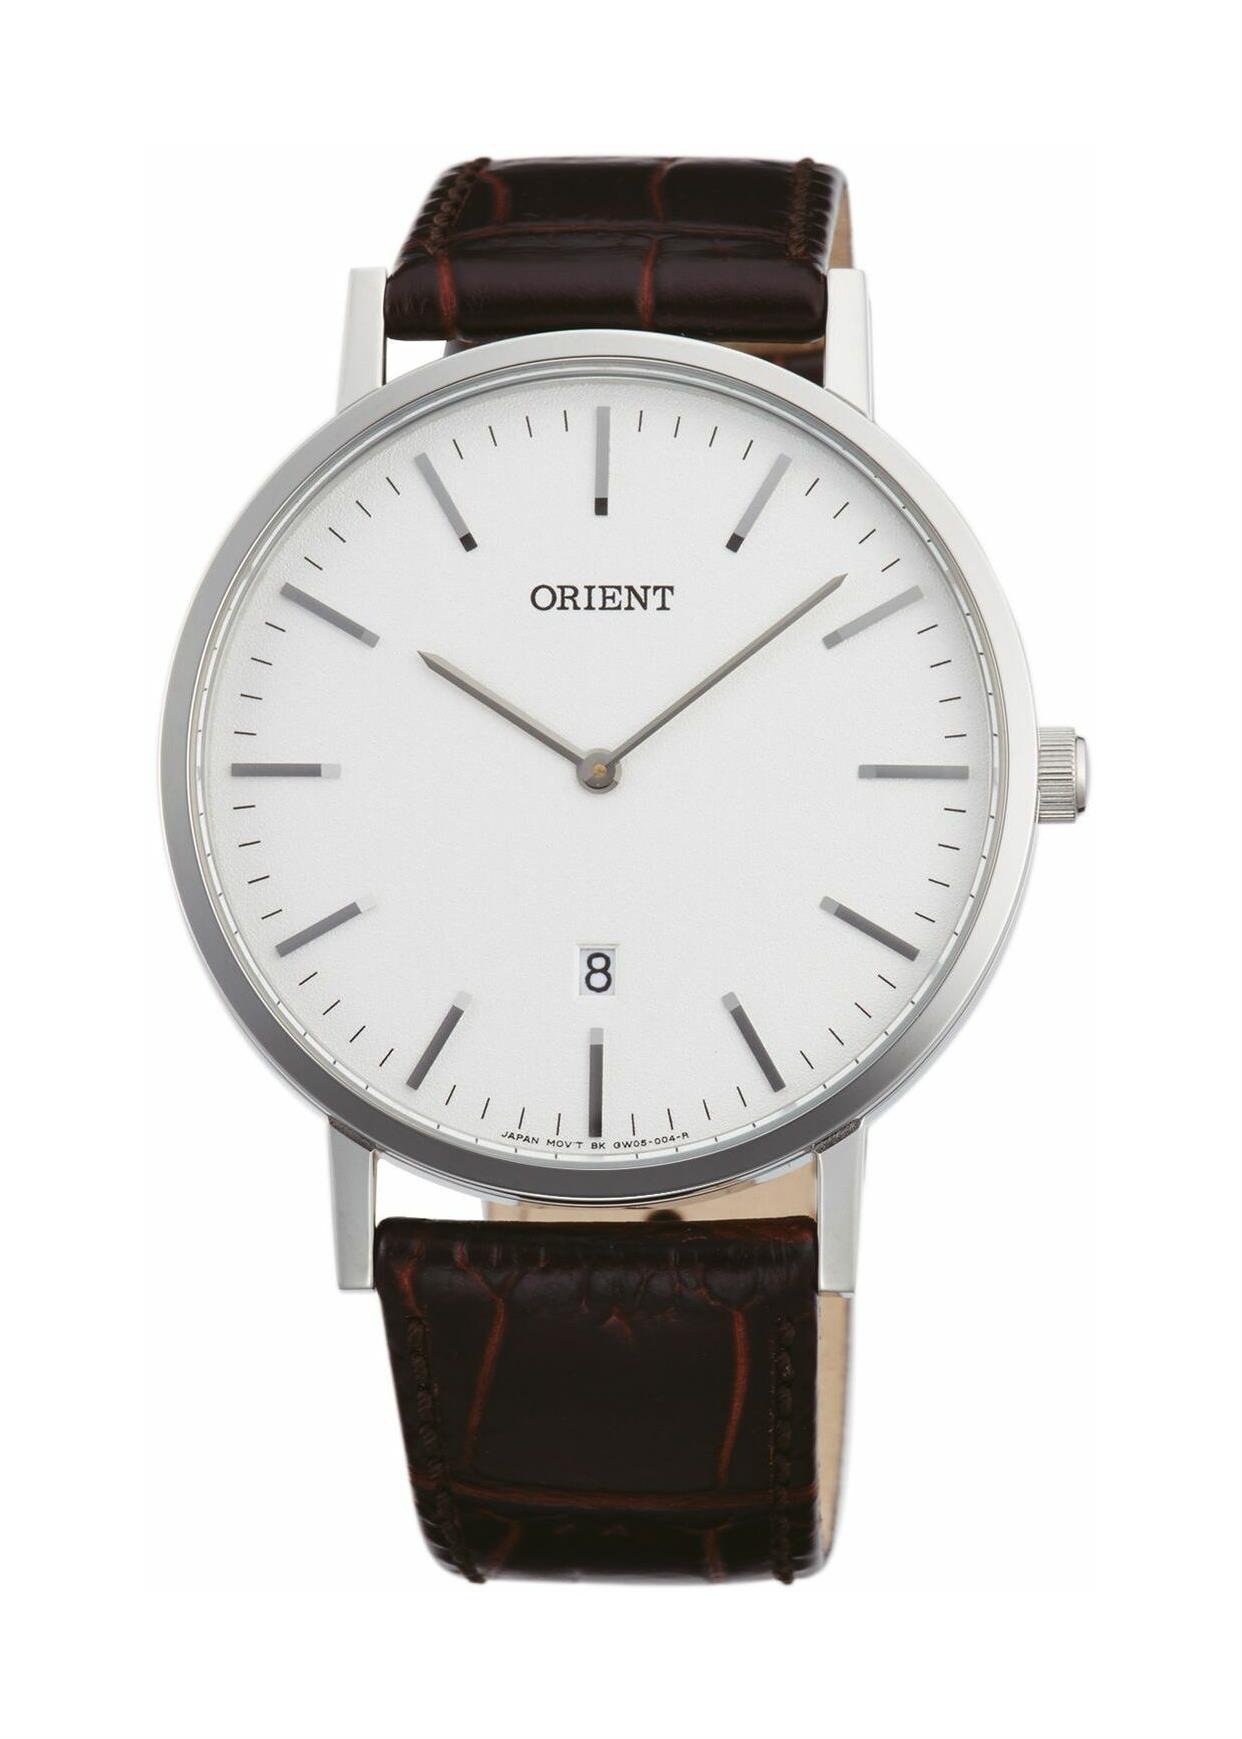 ORIENT Mens Wrist Watch FGW05005W0